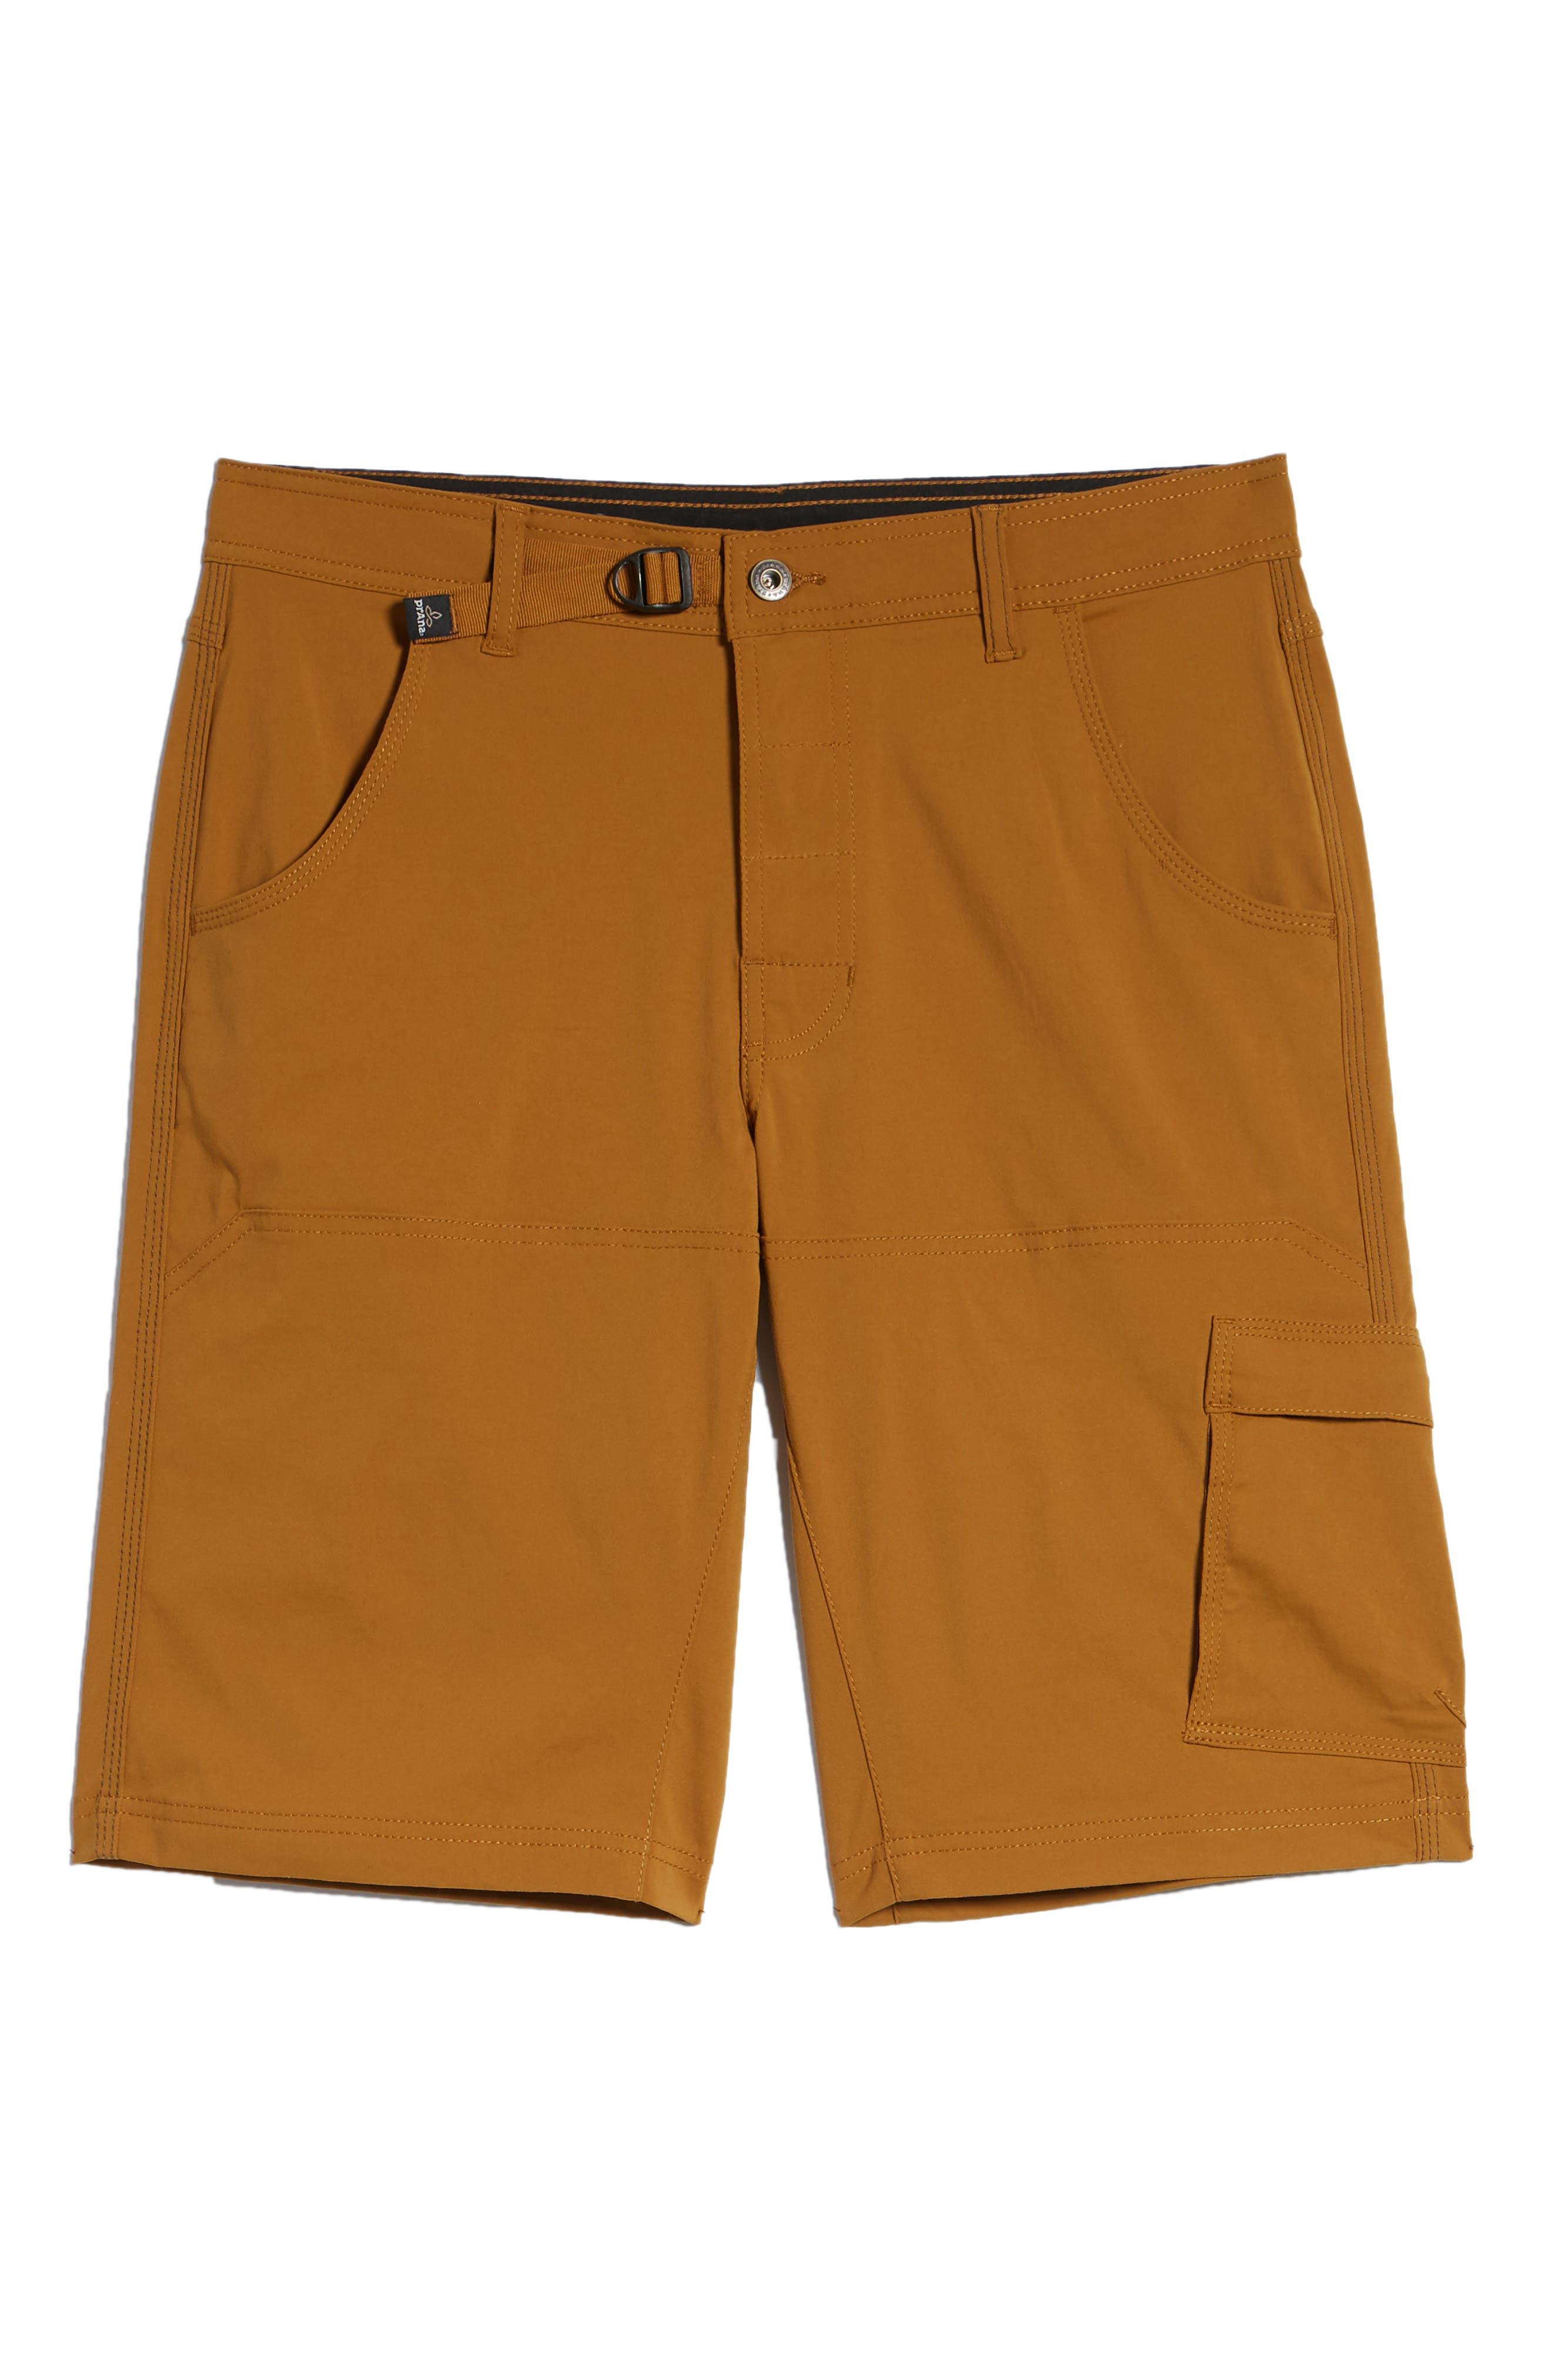 PRANA,                             Zion Stretch Shorts,                             Alternate thumbnail 6, color,                             BRONZED